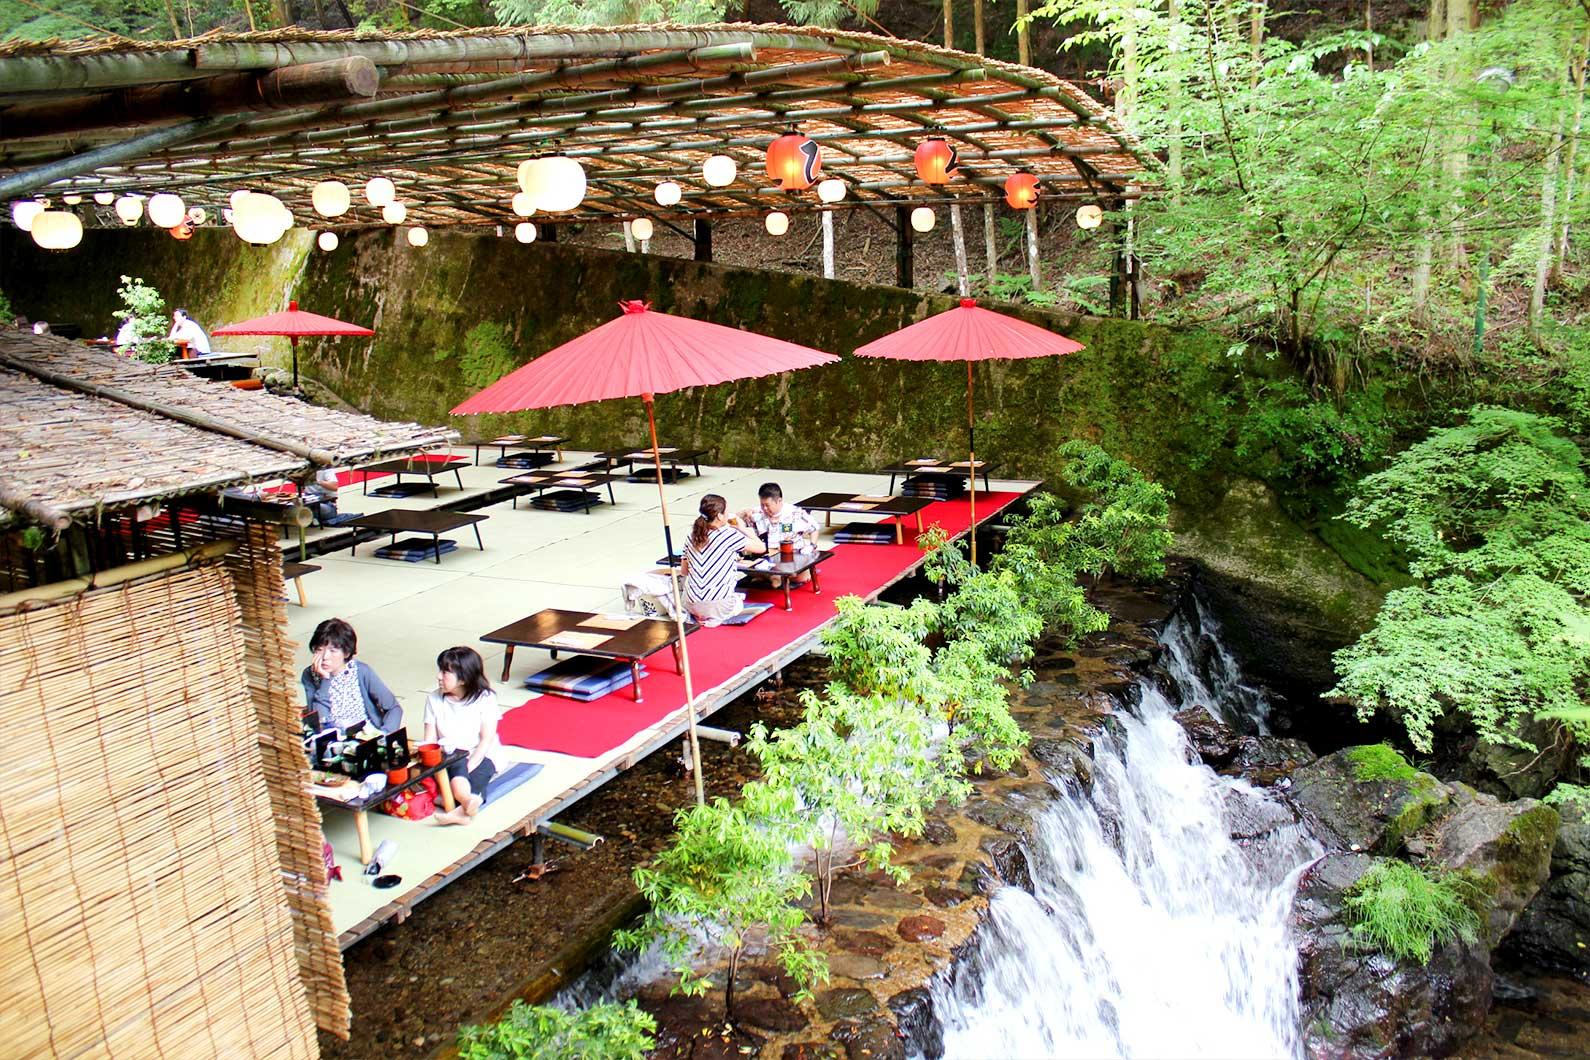 Kawadoko Restaurant Hirobun in Kibune Dine Atop a Waterfall at These Kawadoko Restaurants Hidden in Kyotos Mountains